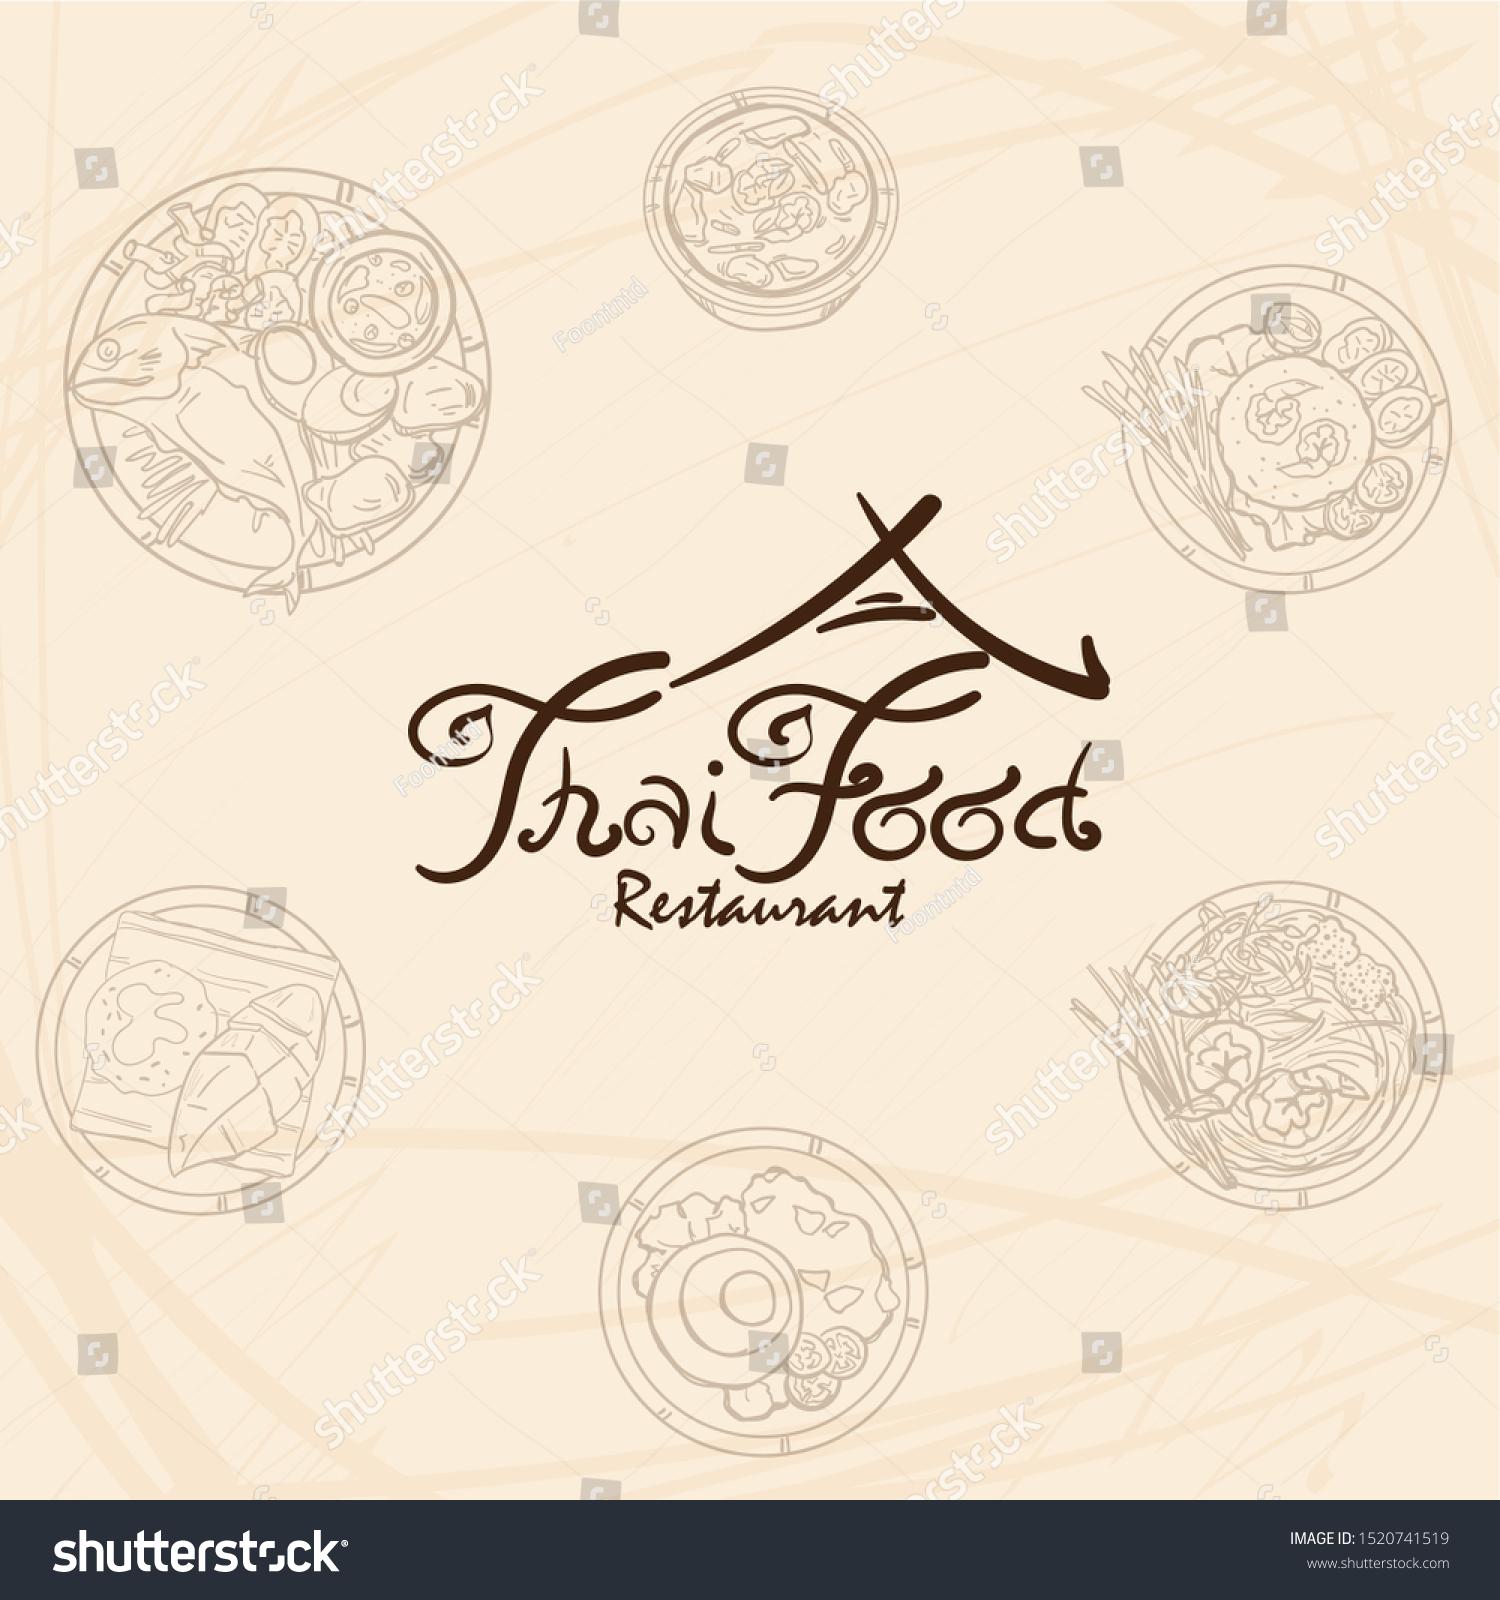 Vector De Stock Libre De Regalias Sobre Thai Food Restaurant Logo Icon Graphic1520741519